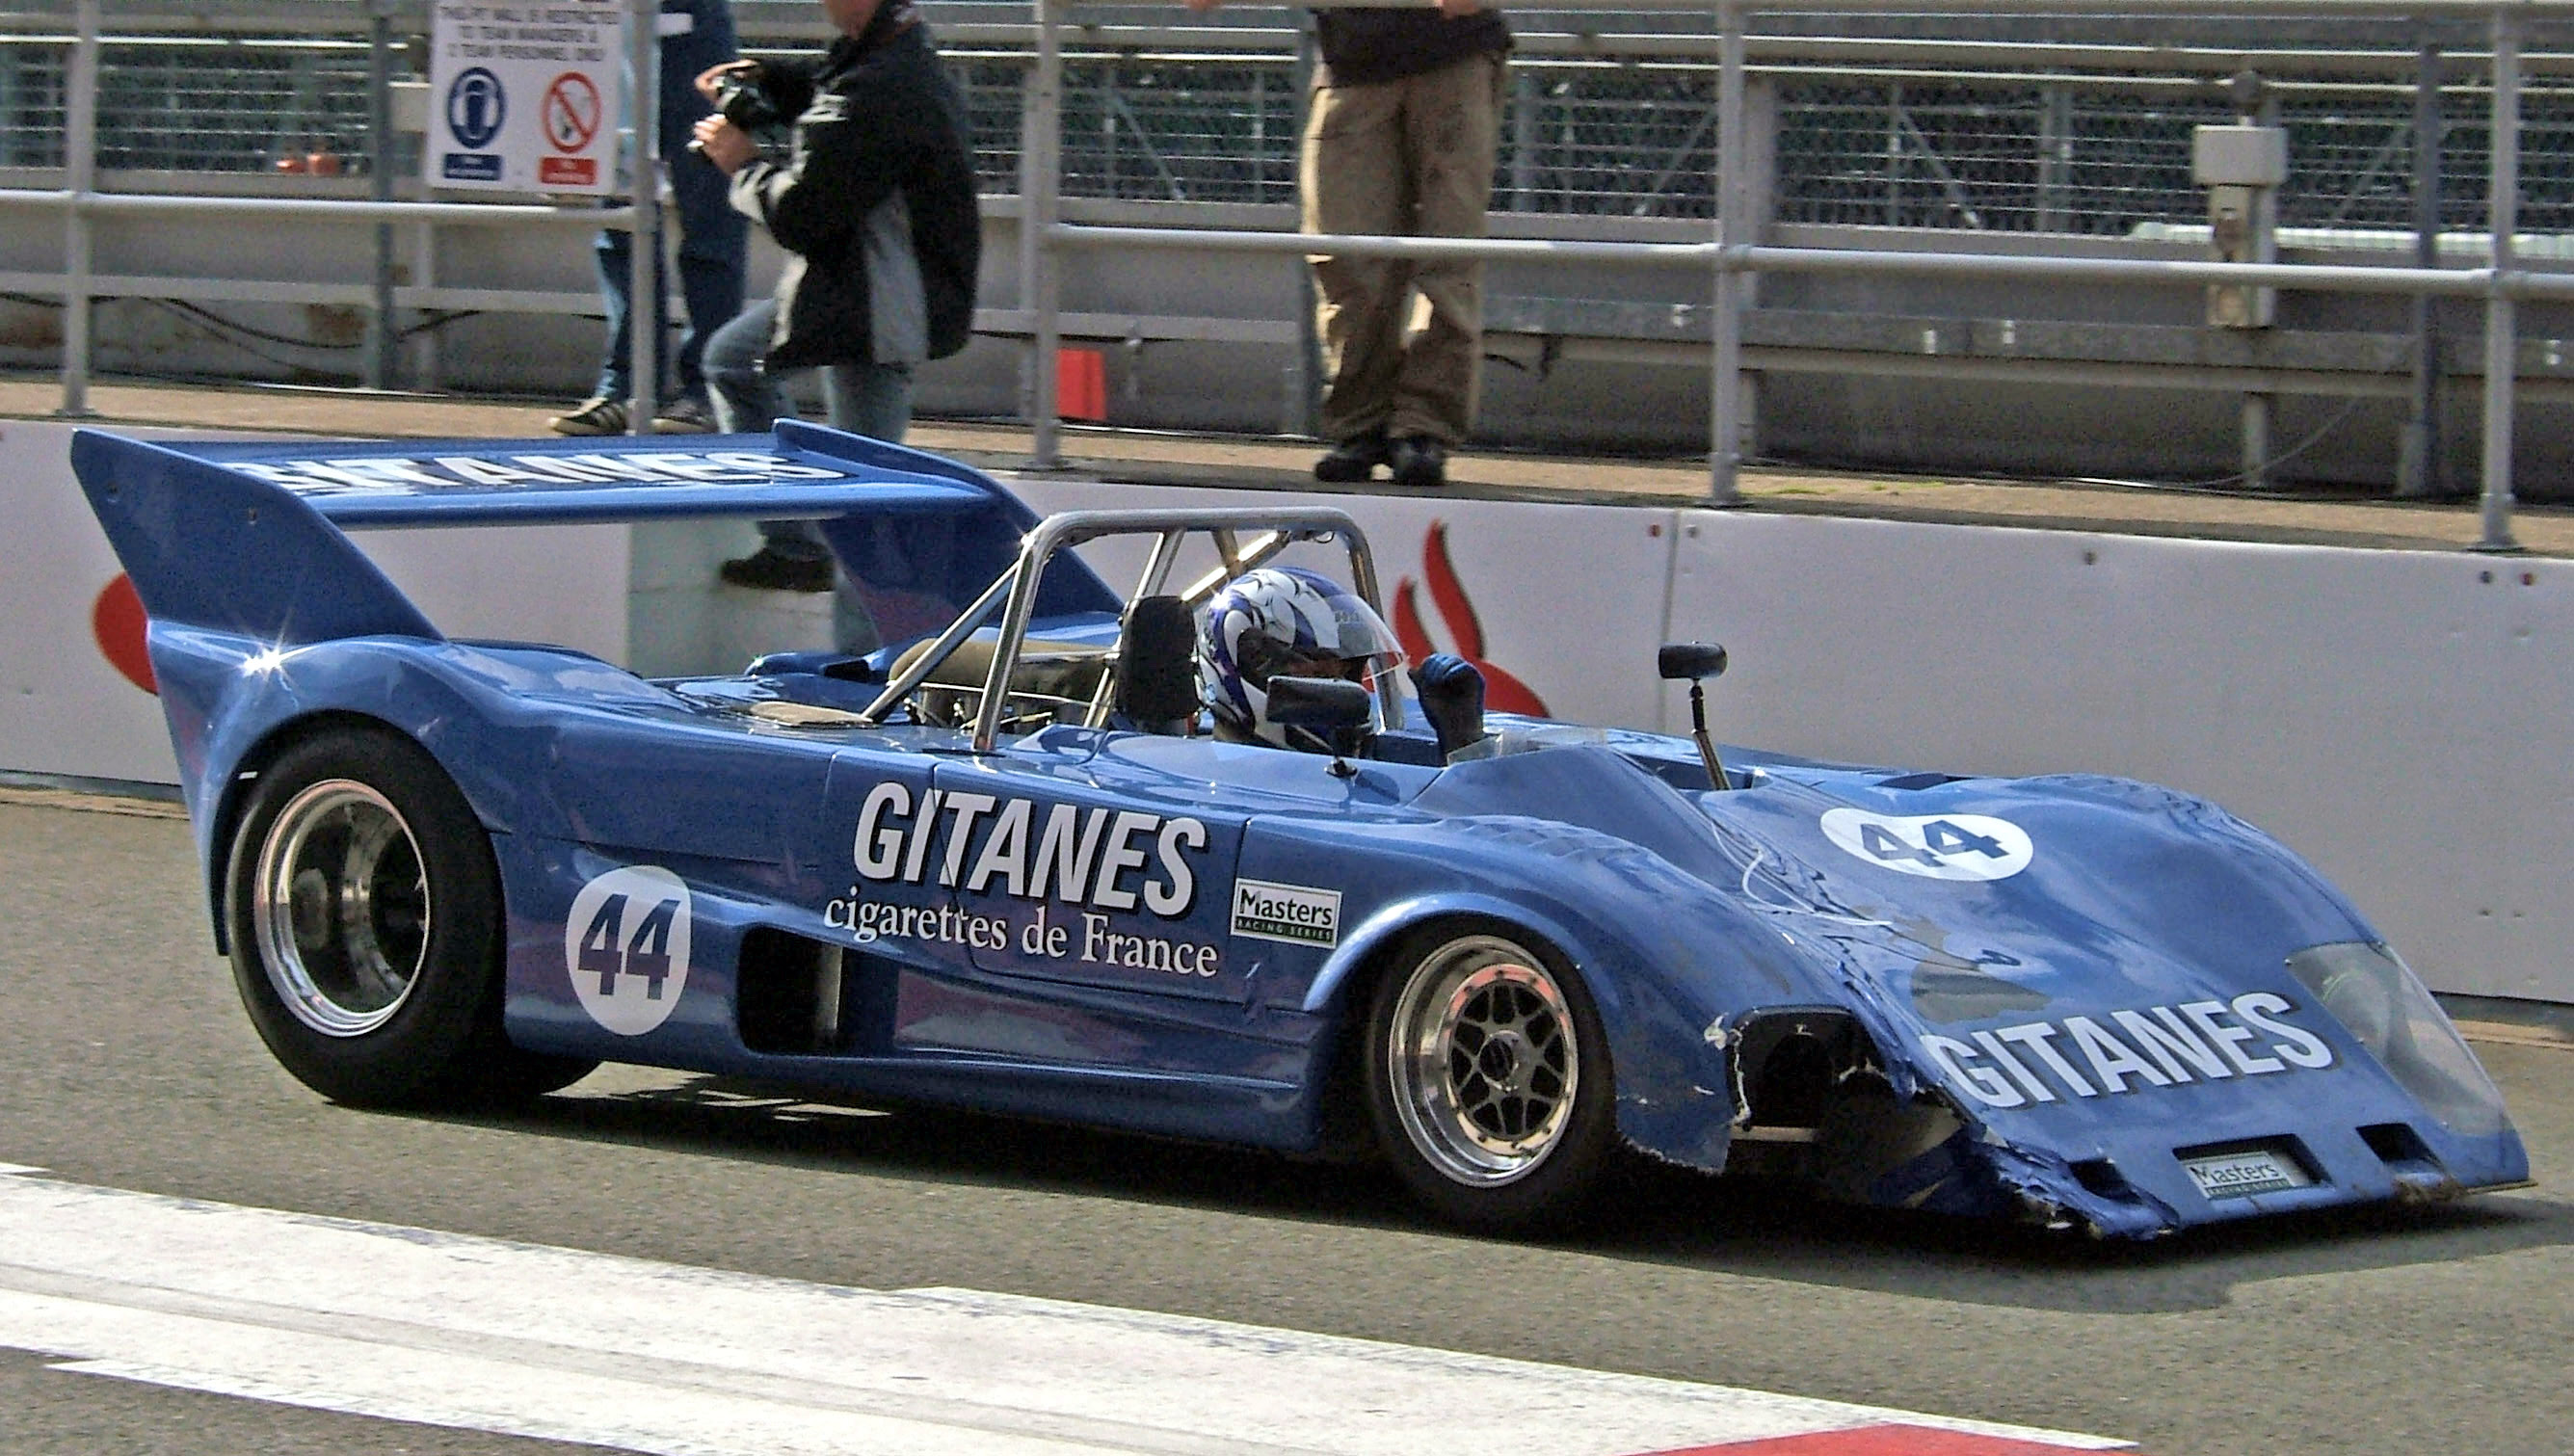 Lola_T280_Silverstone_pits.jpg